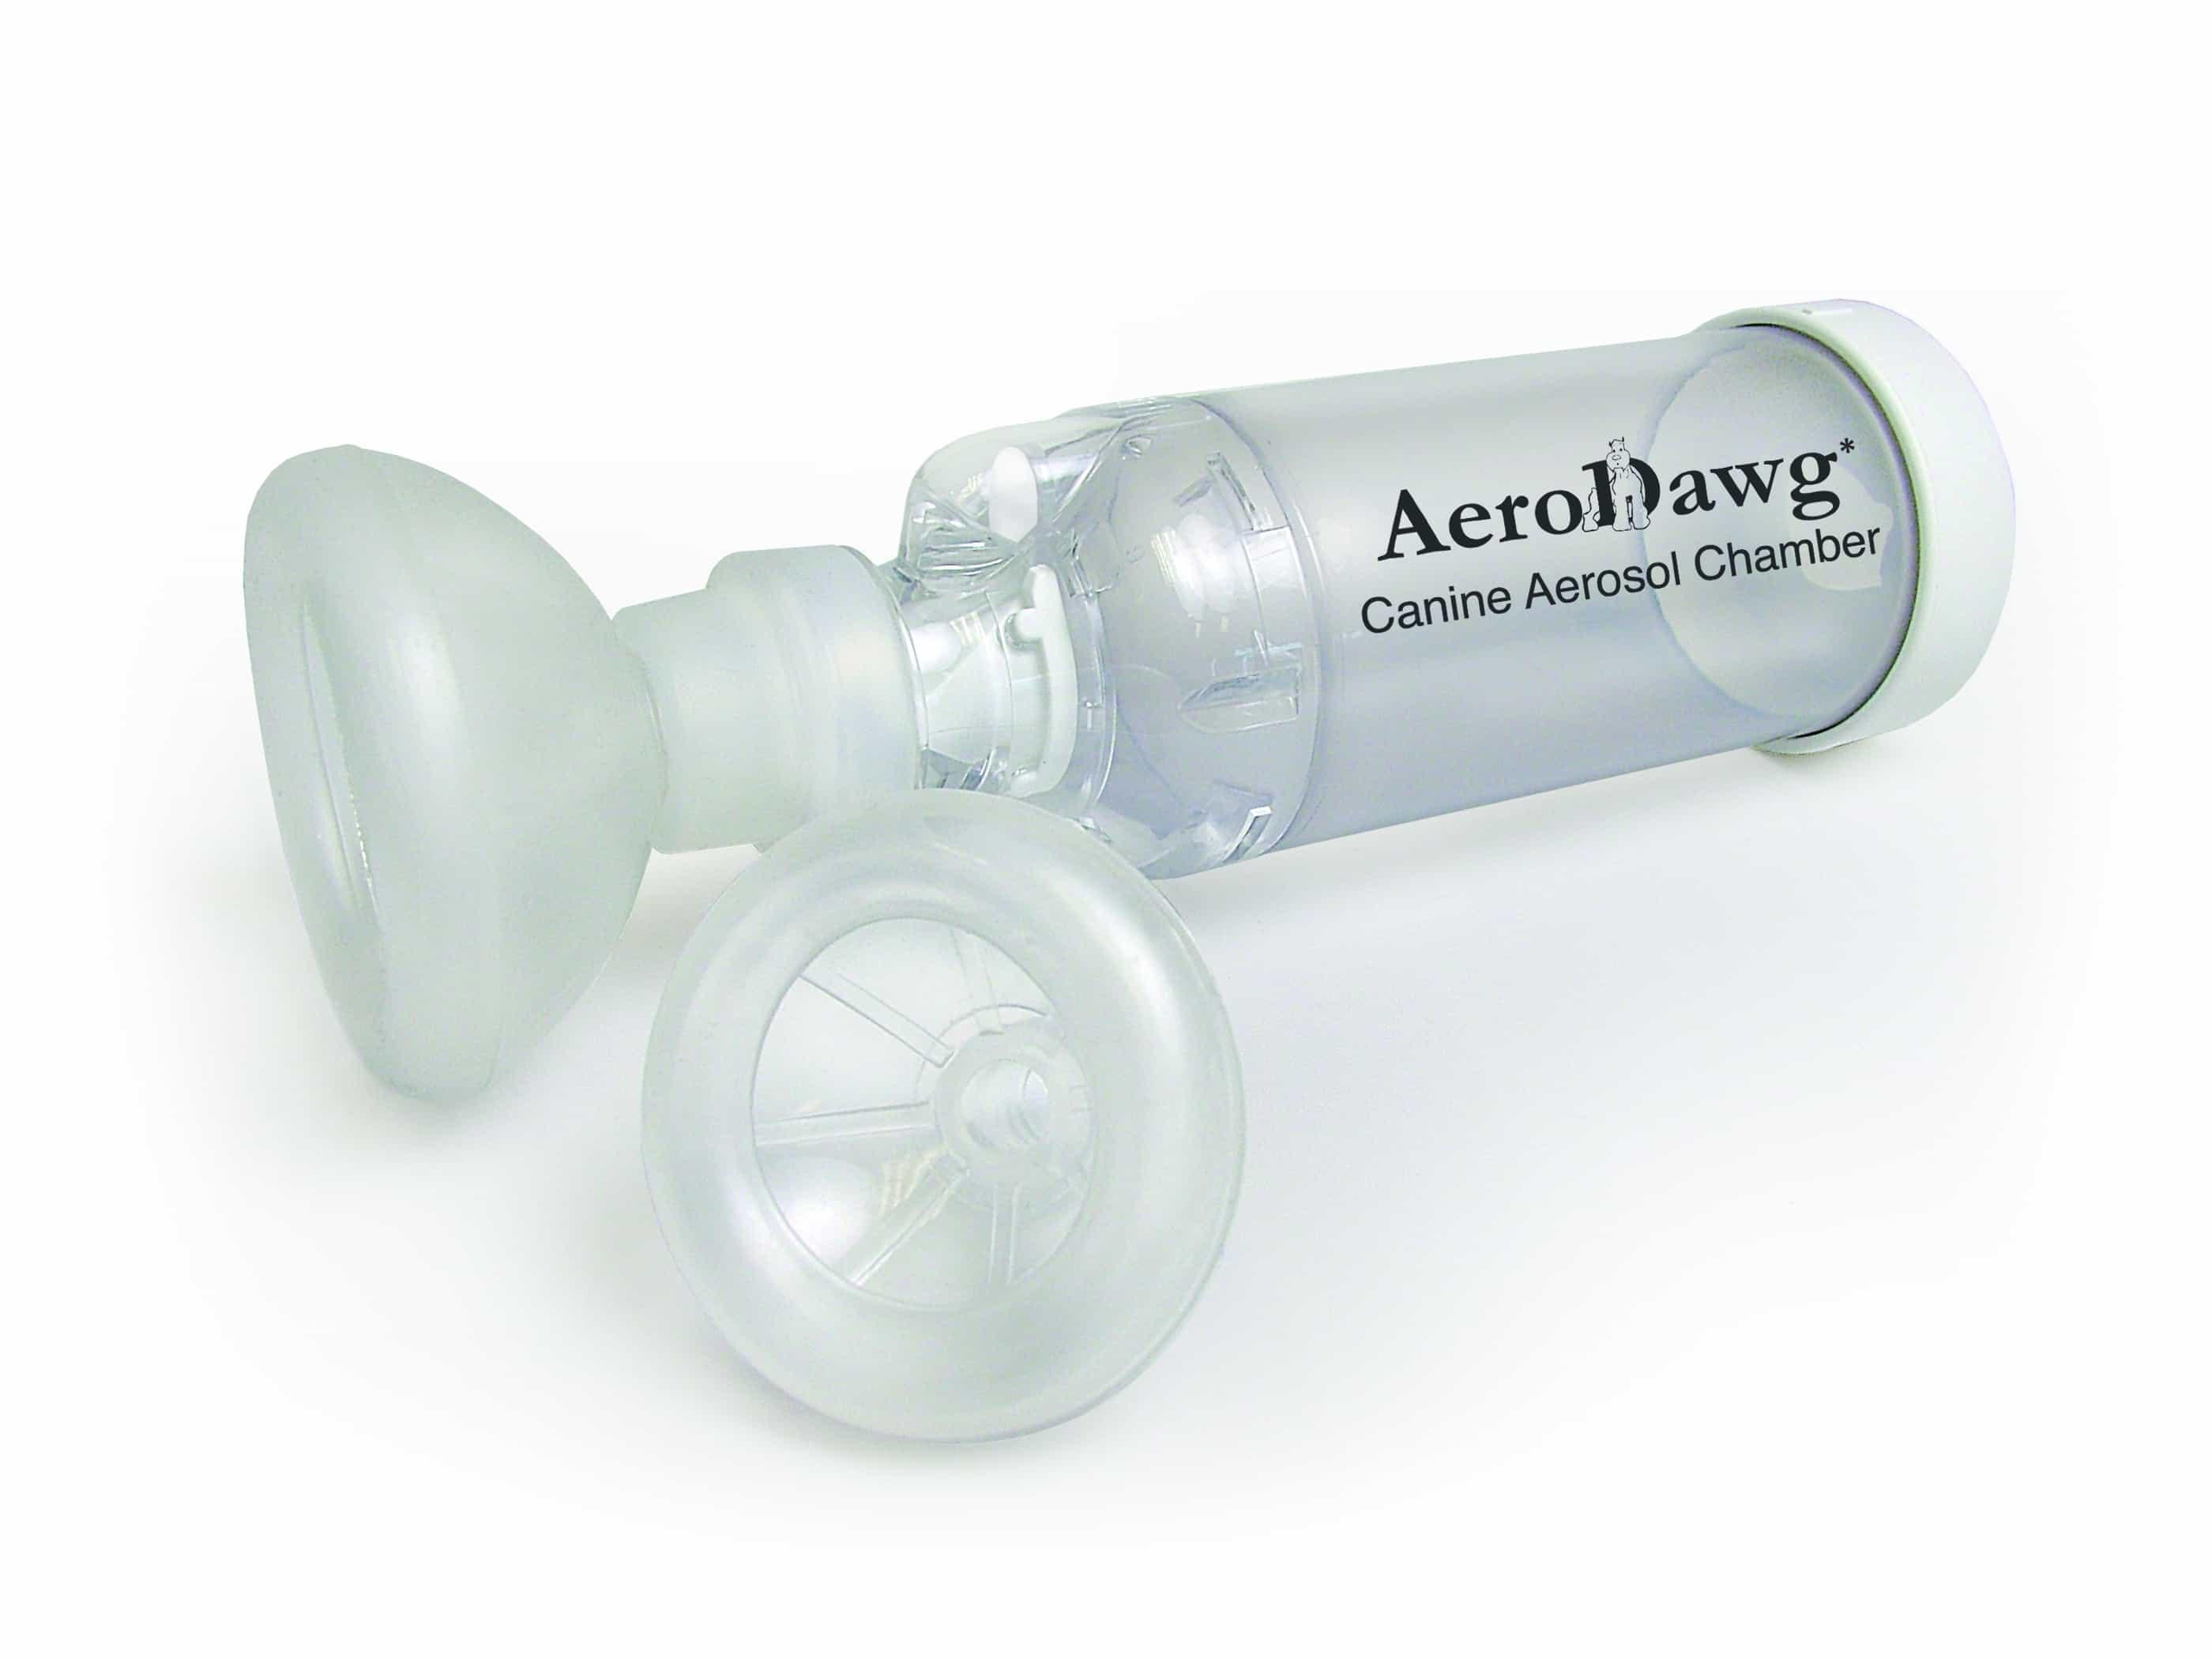 AeroDawg Small